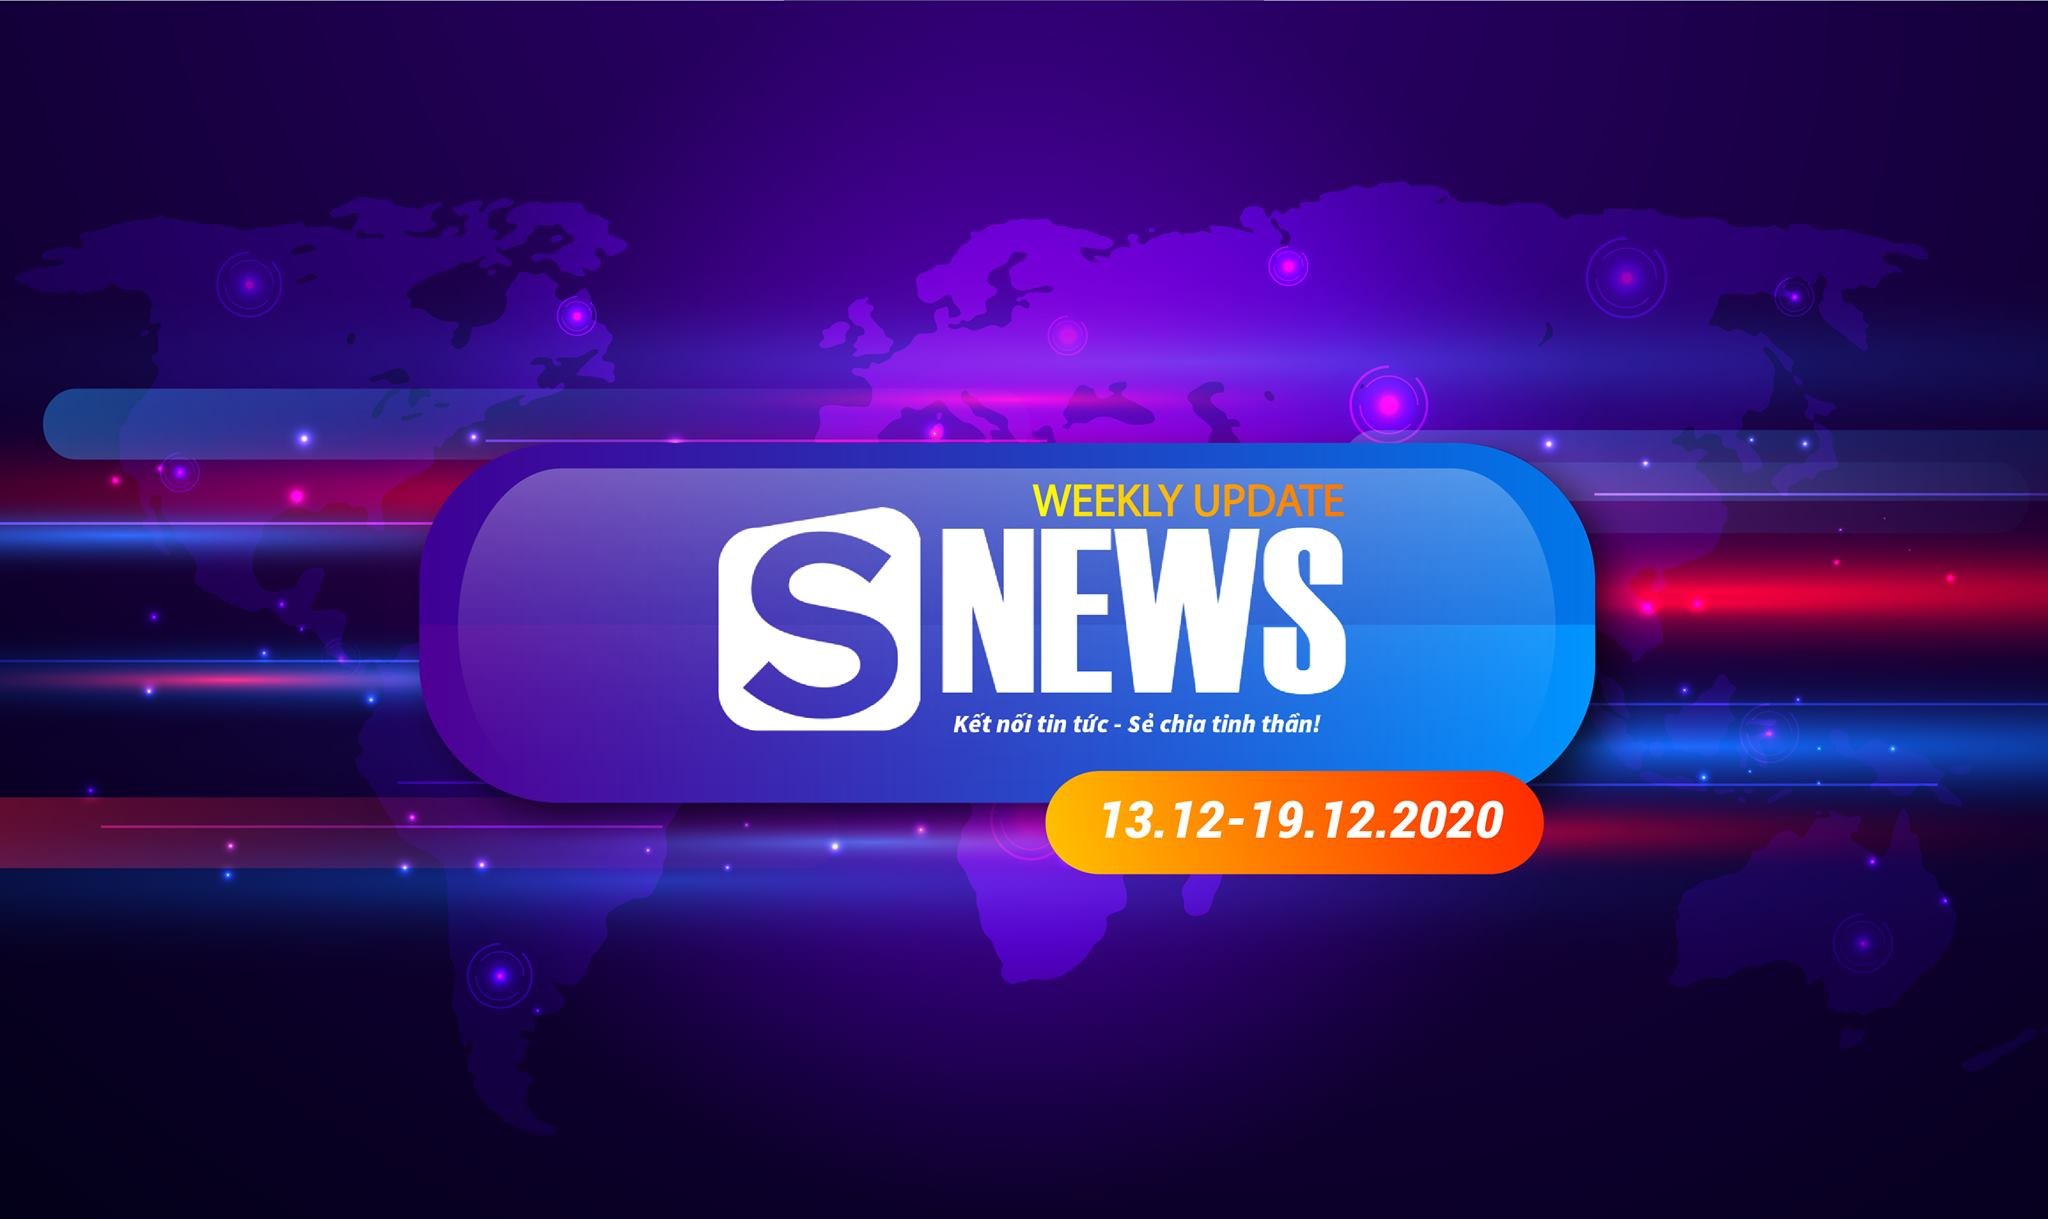 Tổng hợp tin tức Sapo tuần qua: 13.12 - 19.12.2020